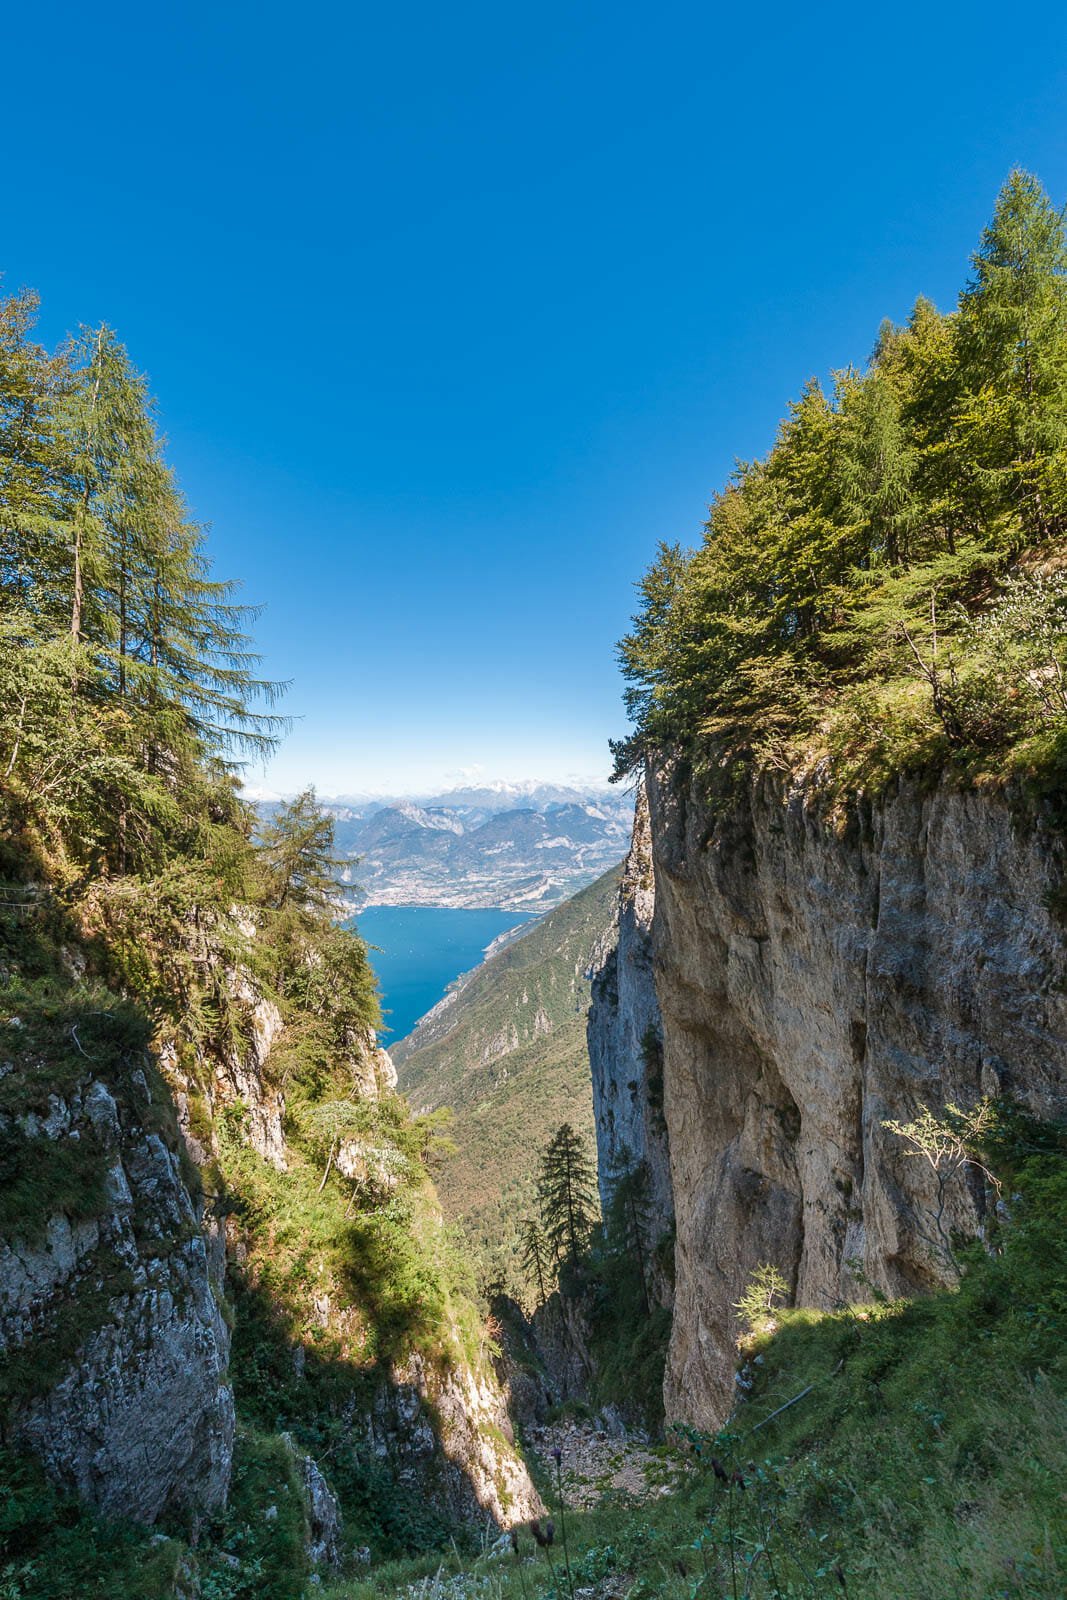 Ventrar path on Monte Baldo and lake view